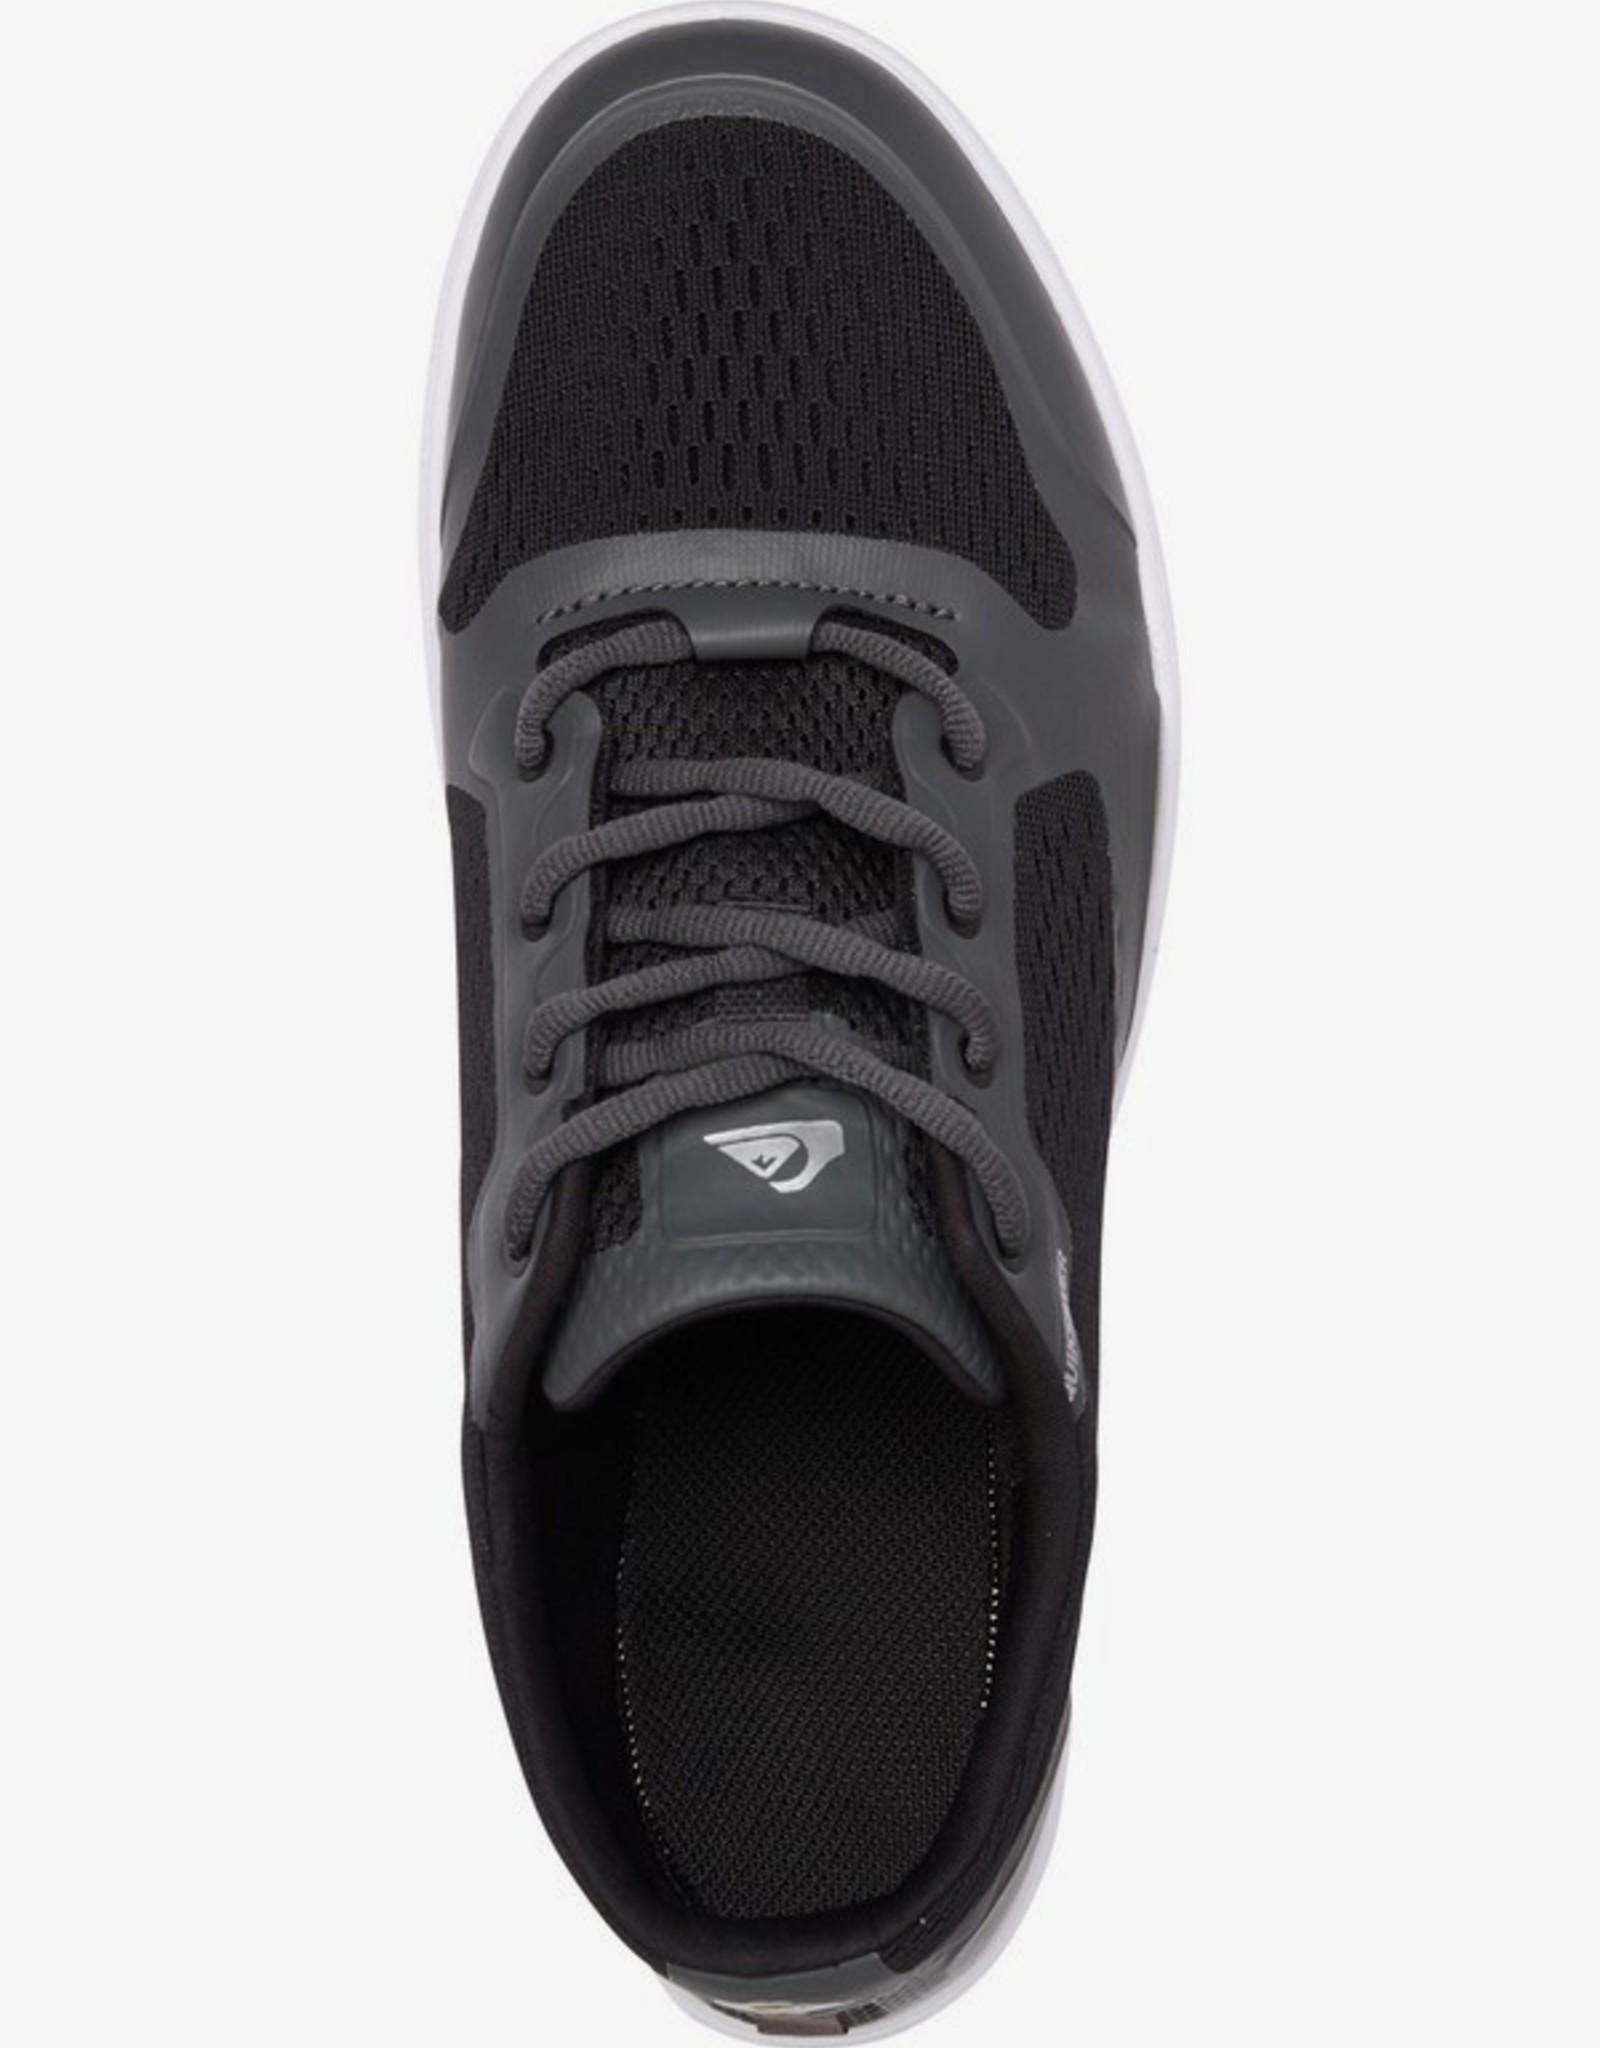 Quiksilver Amhibian II Plus Shoes